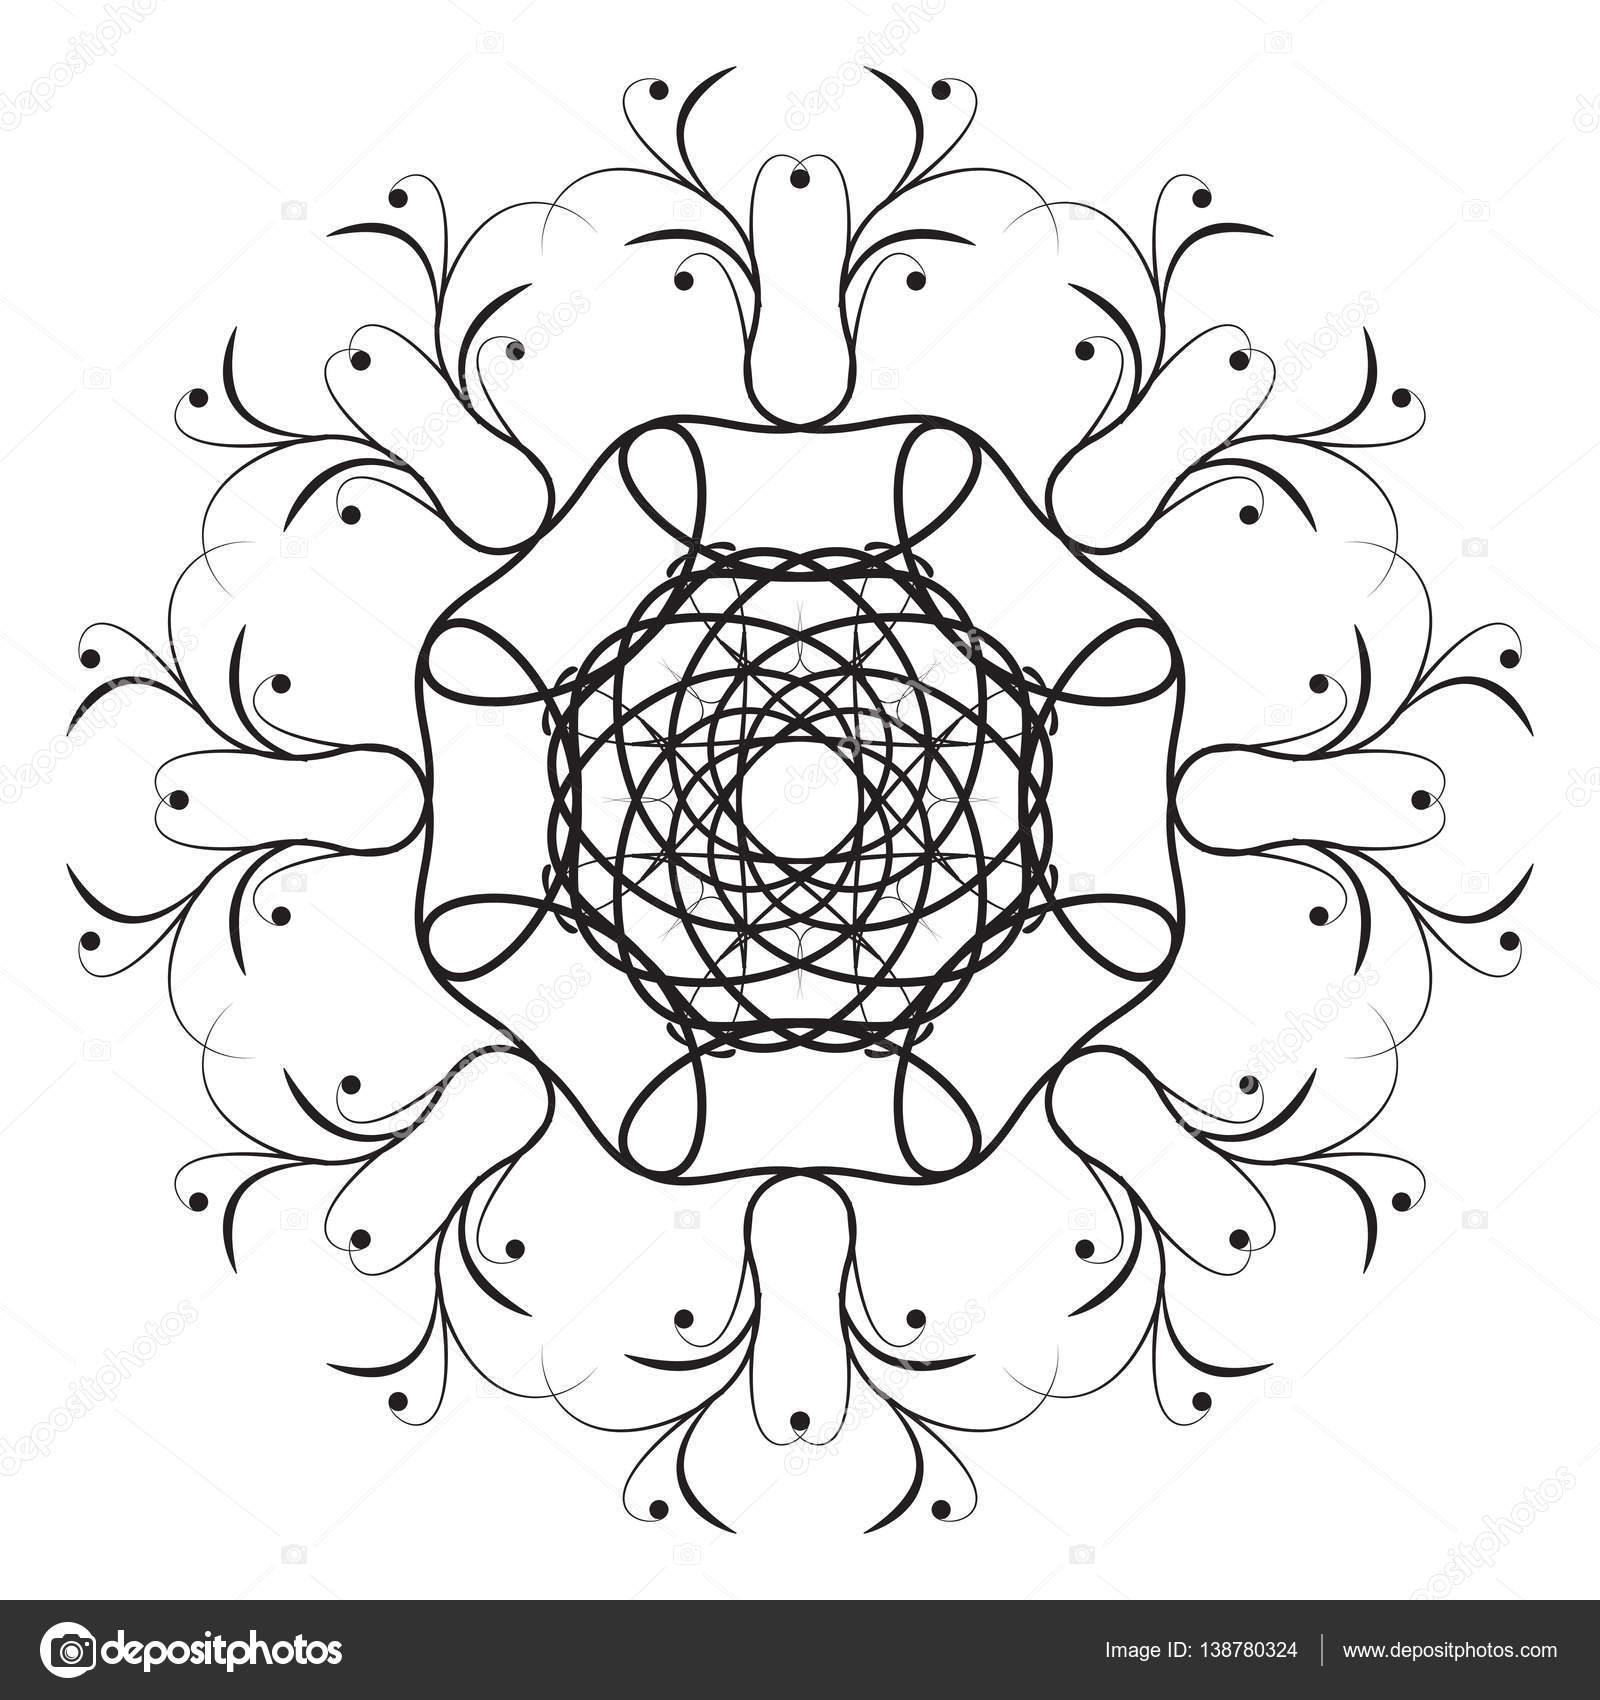 Mandala Malvorlagen Seite doodle — Stockvektor © OrigaZ #138780324